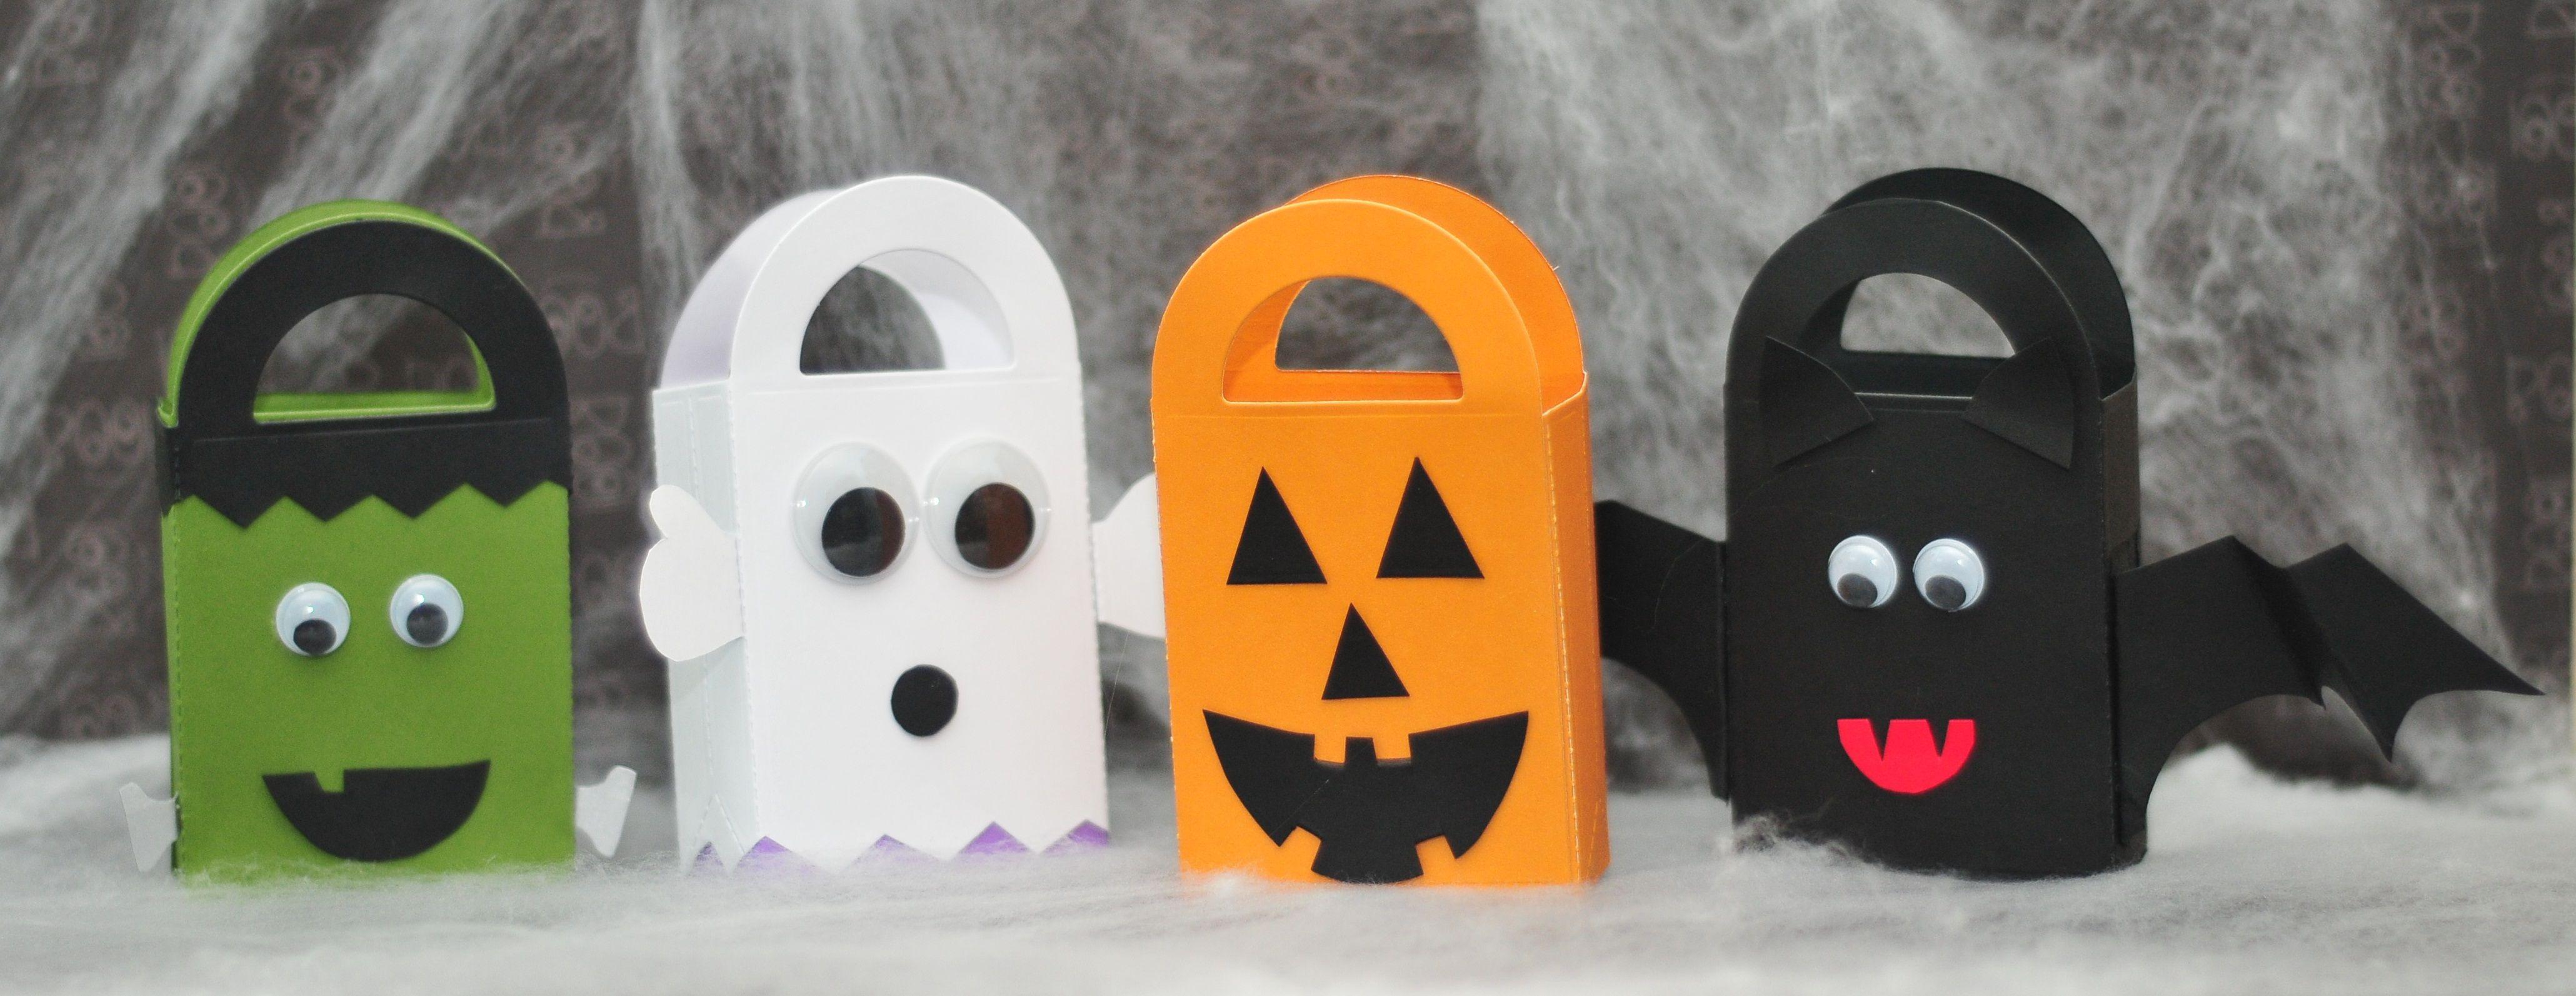 diy halloween treat bags - Kids Halloween Treat Bags